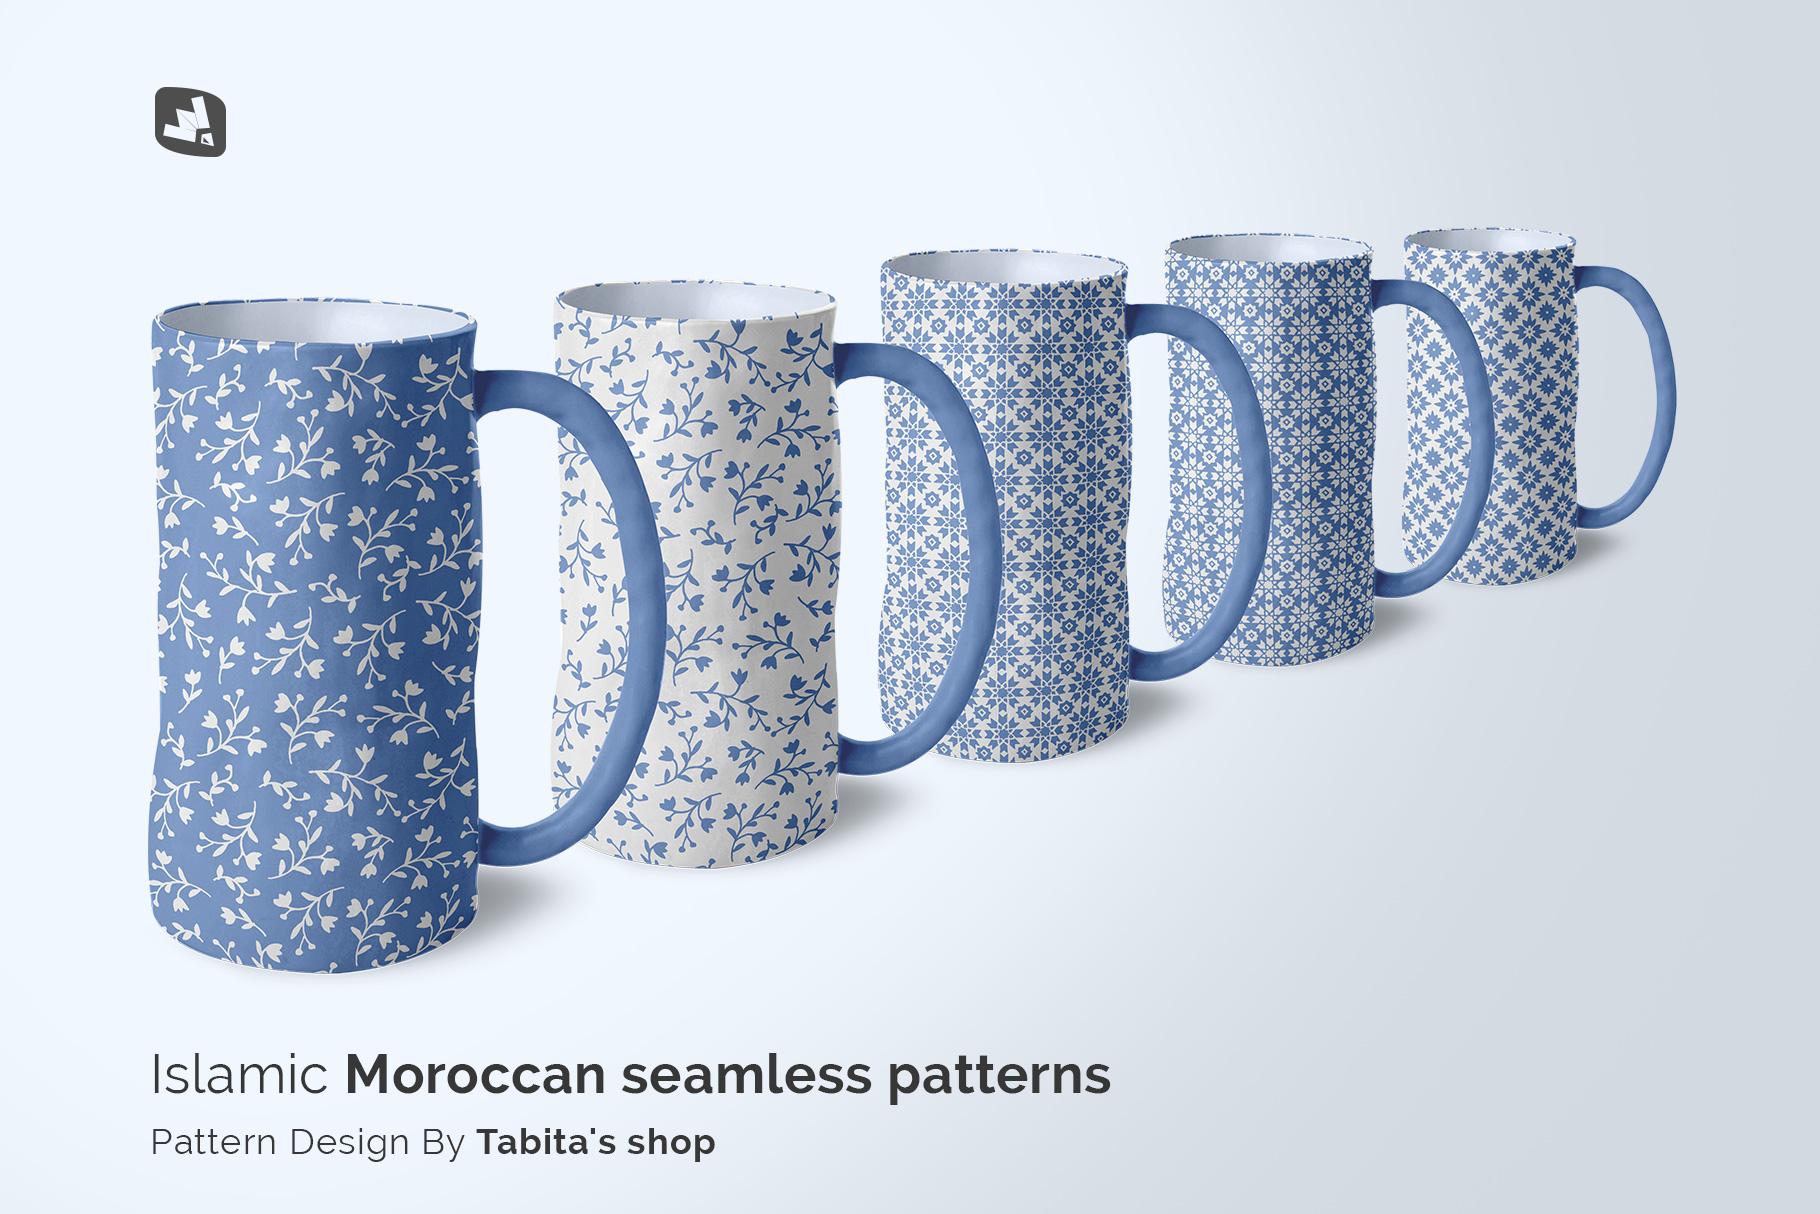 designer's credit of the ceramic jug set mockup